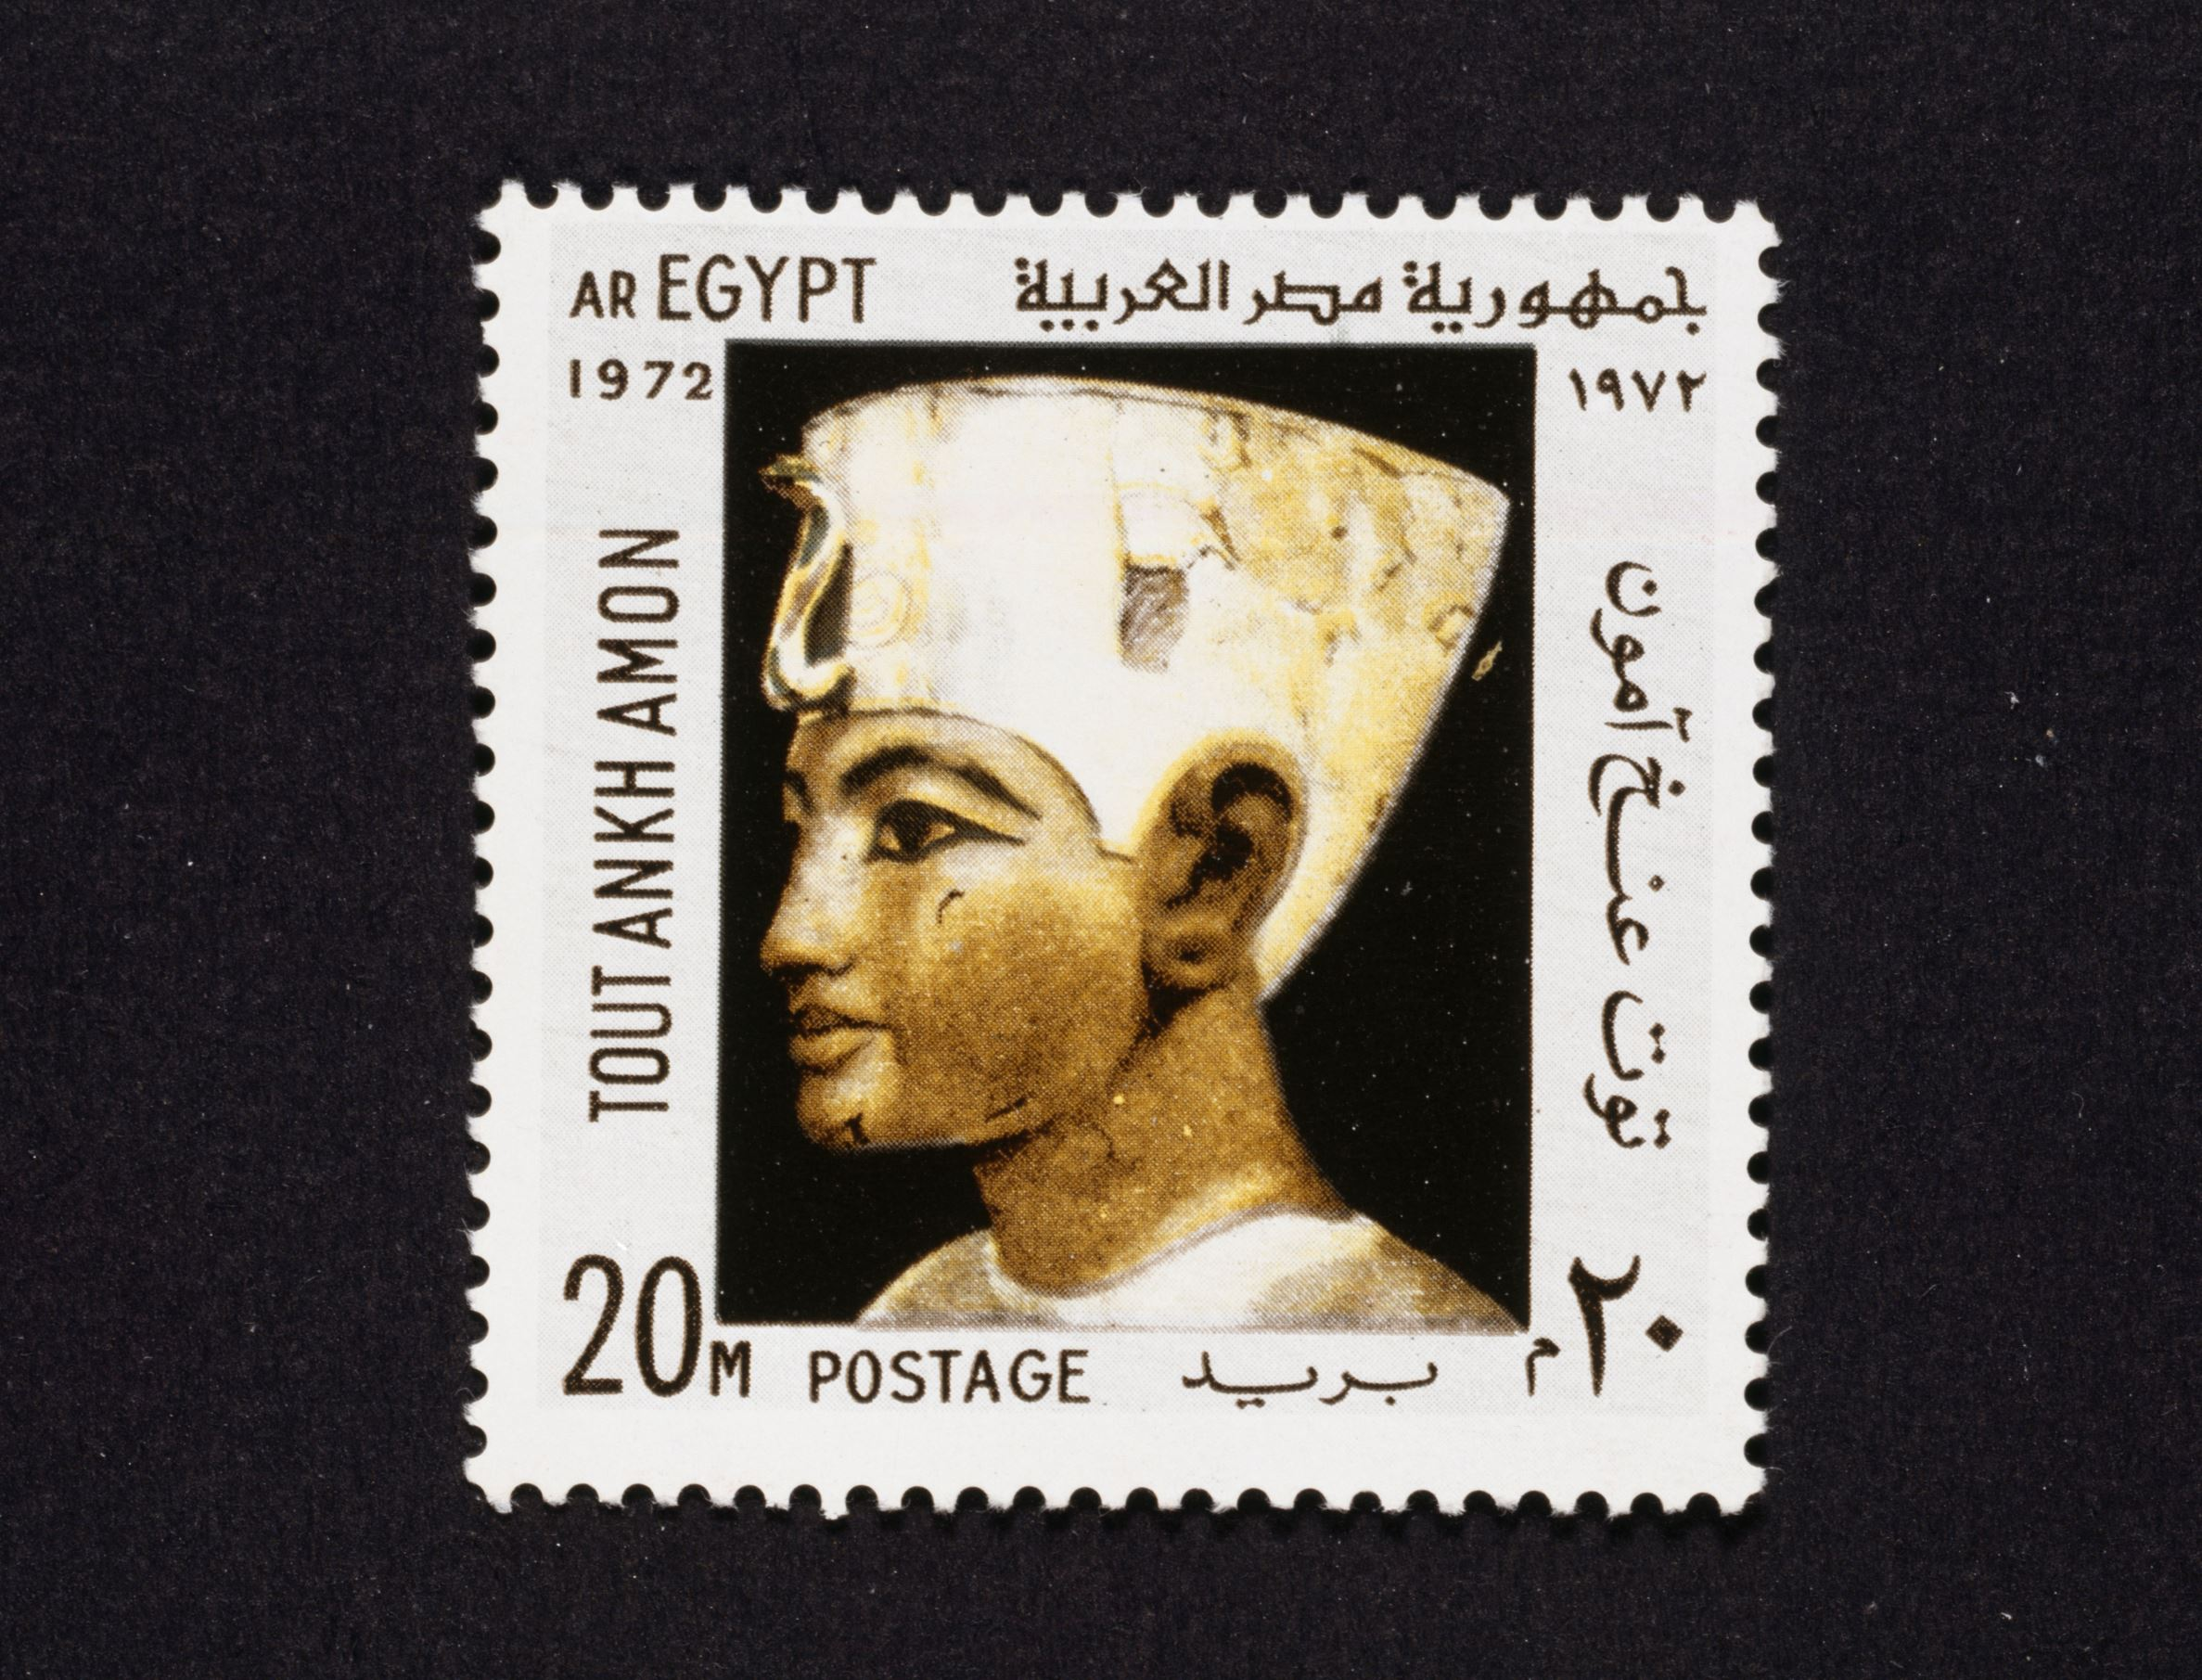 Slide 31 of 70: EGYPT - SEPTEMBER 06: Postage stamp depicting the Pharaoh Tutankhamun (1341-1323 BC), 1972. Egypt, 20th century. Egypt (Photo by DeAgostini/Getty Images)